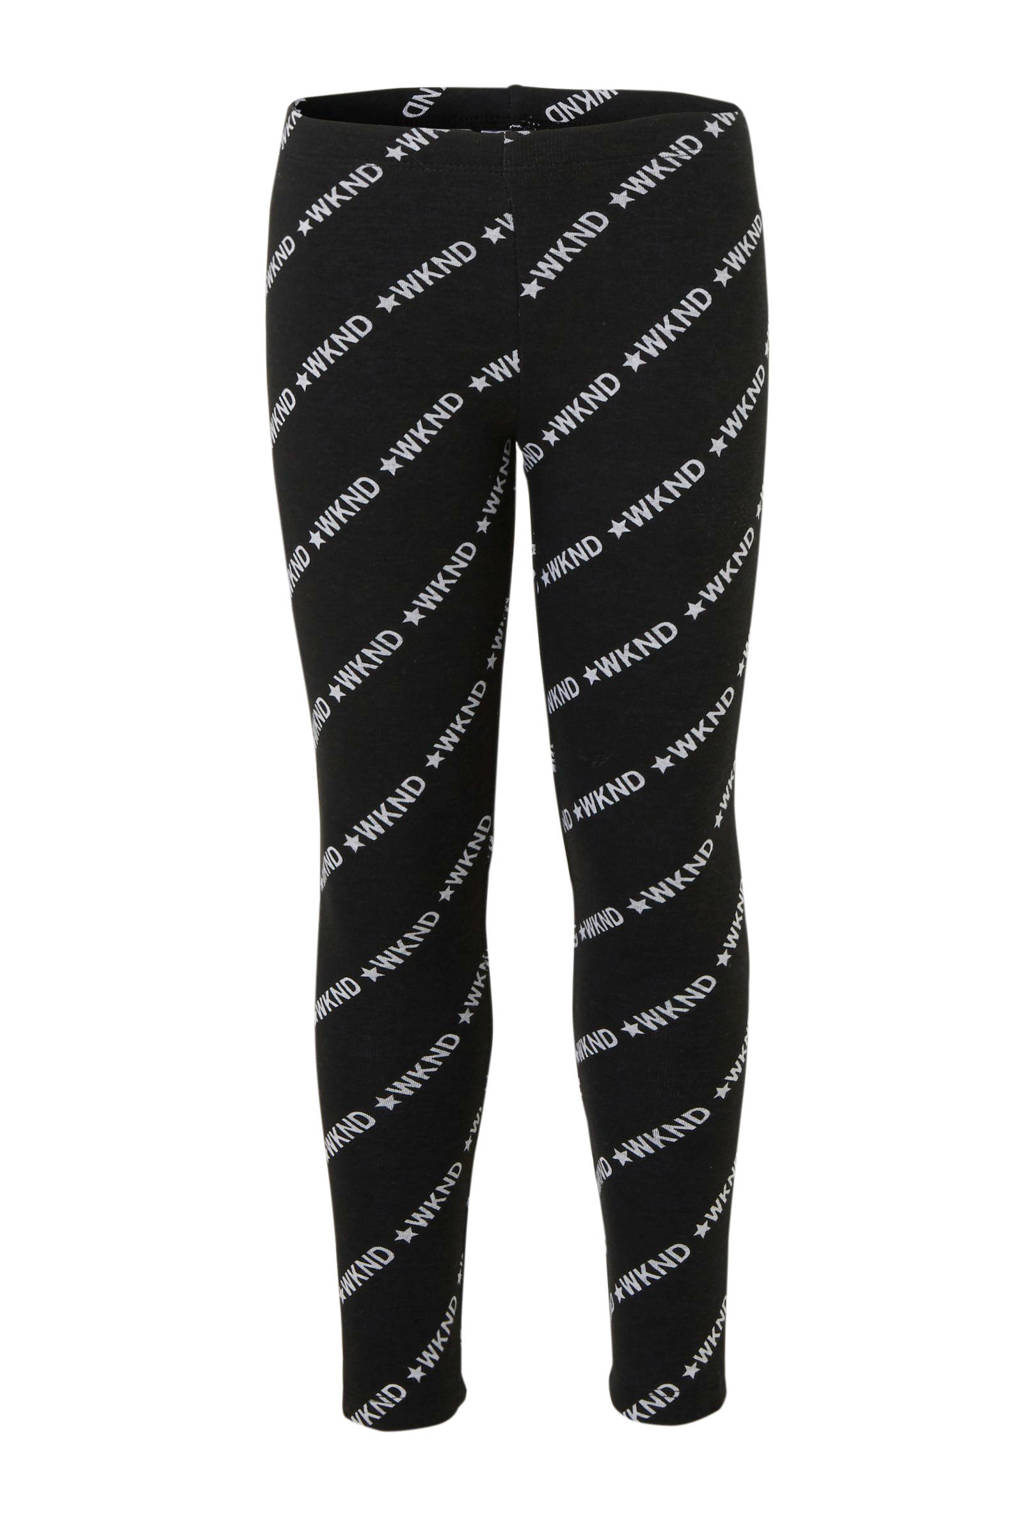 C&A Here & There thermo legging met printopdruk zwart/wit, Zwart/wit